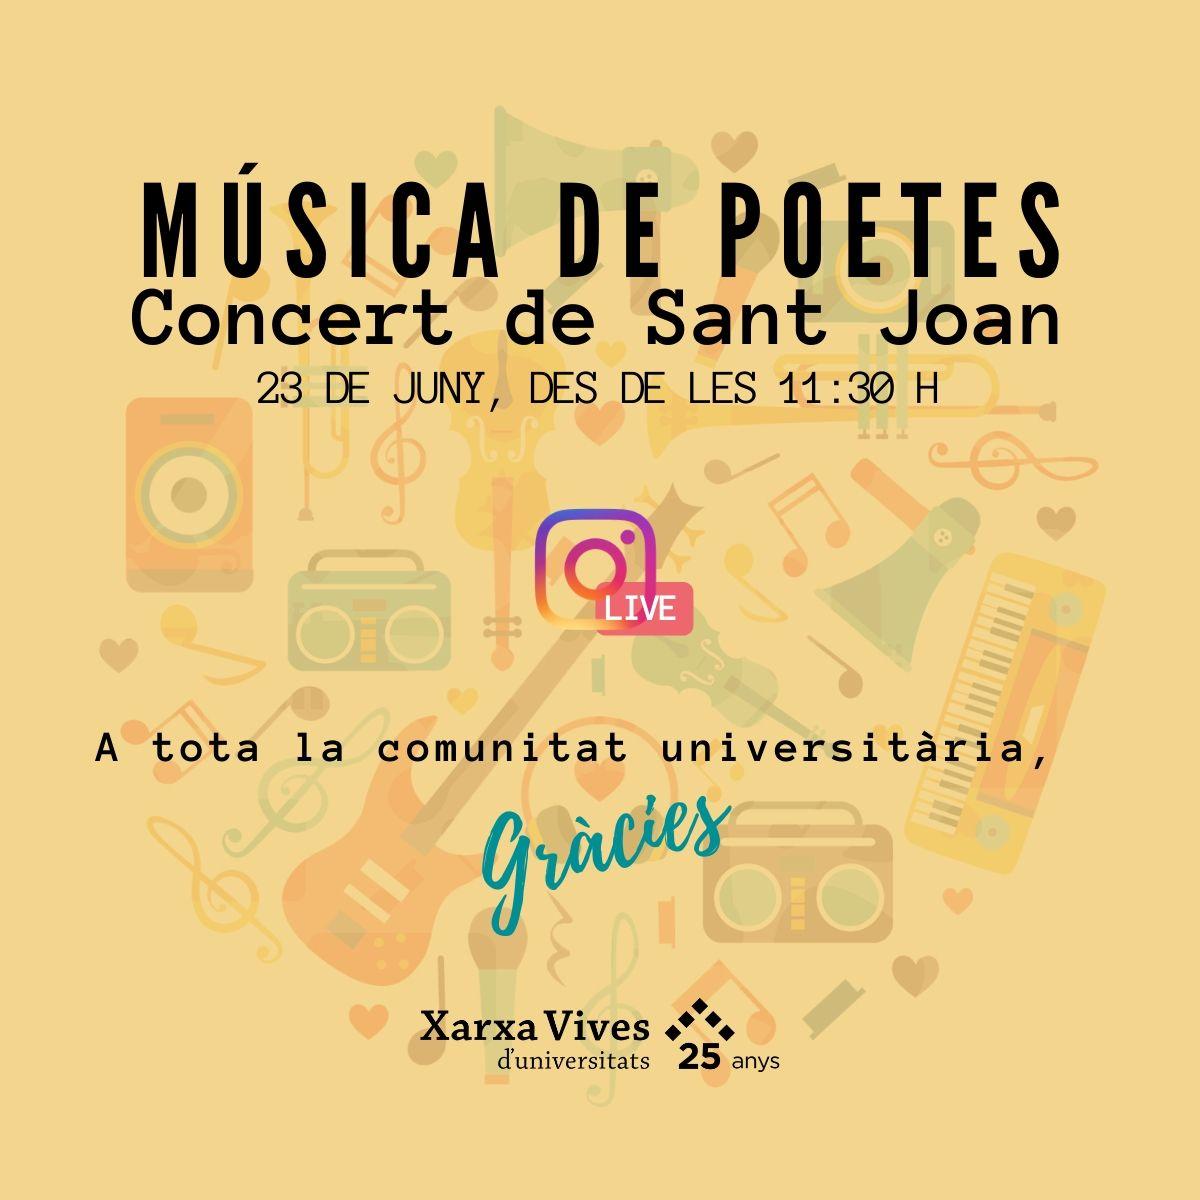 Concert de Sant Joan Música de poetes